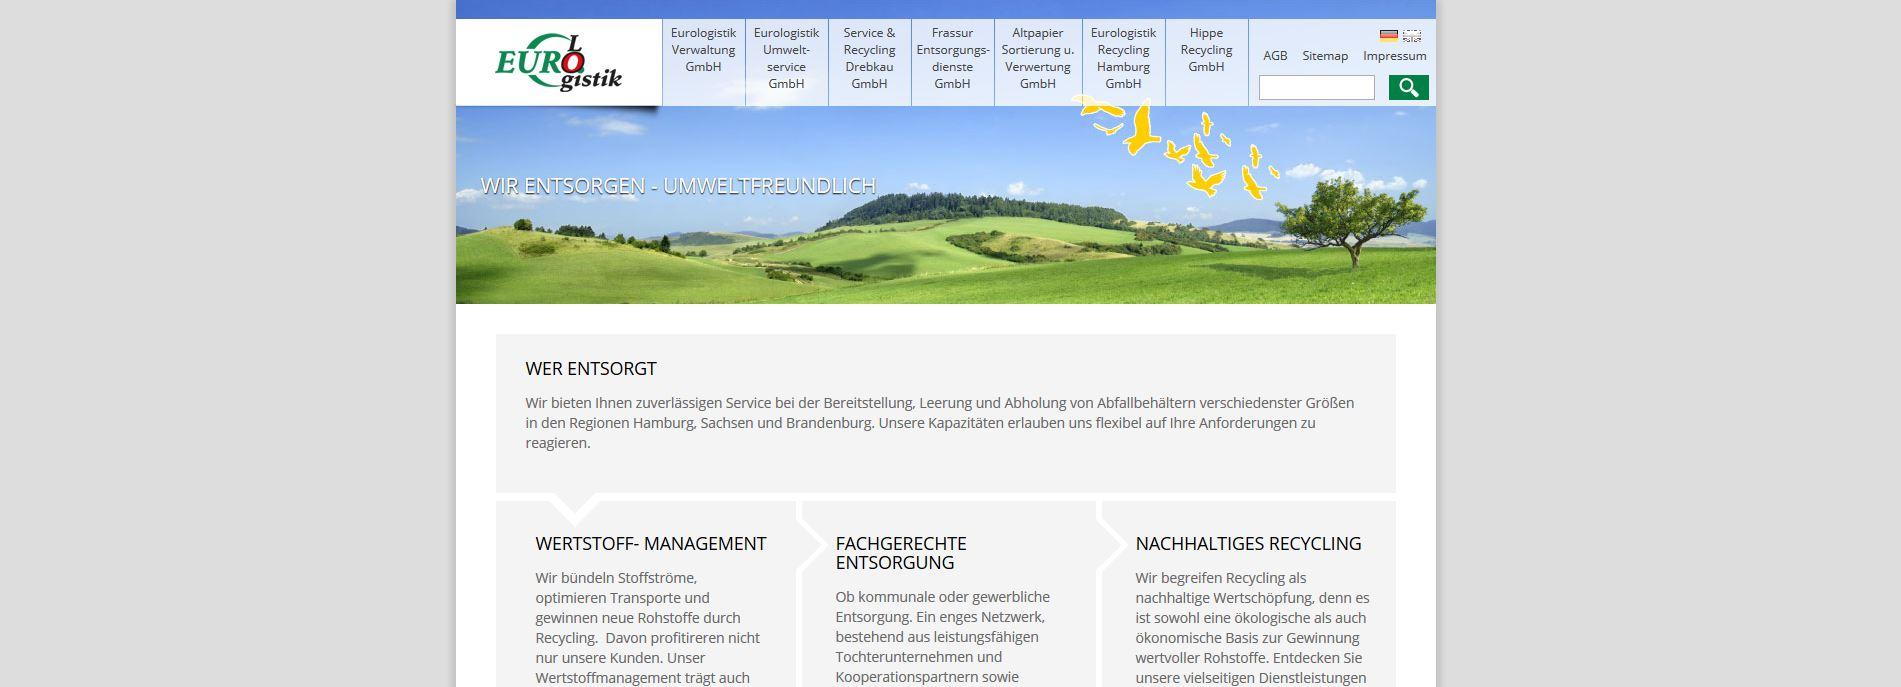 Eurologistik Verwaltung GmbH, Senftenberg